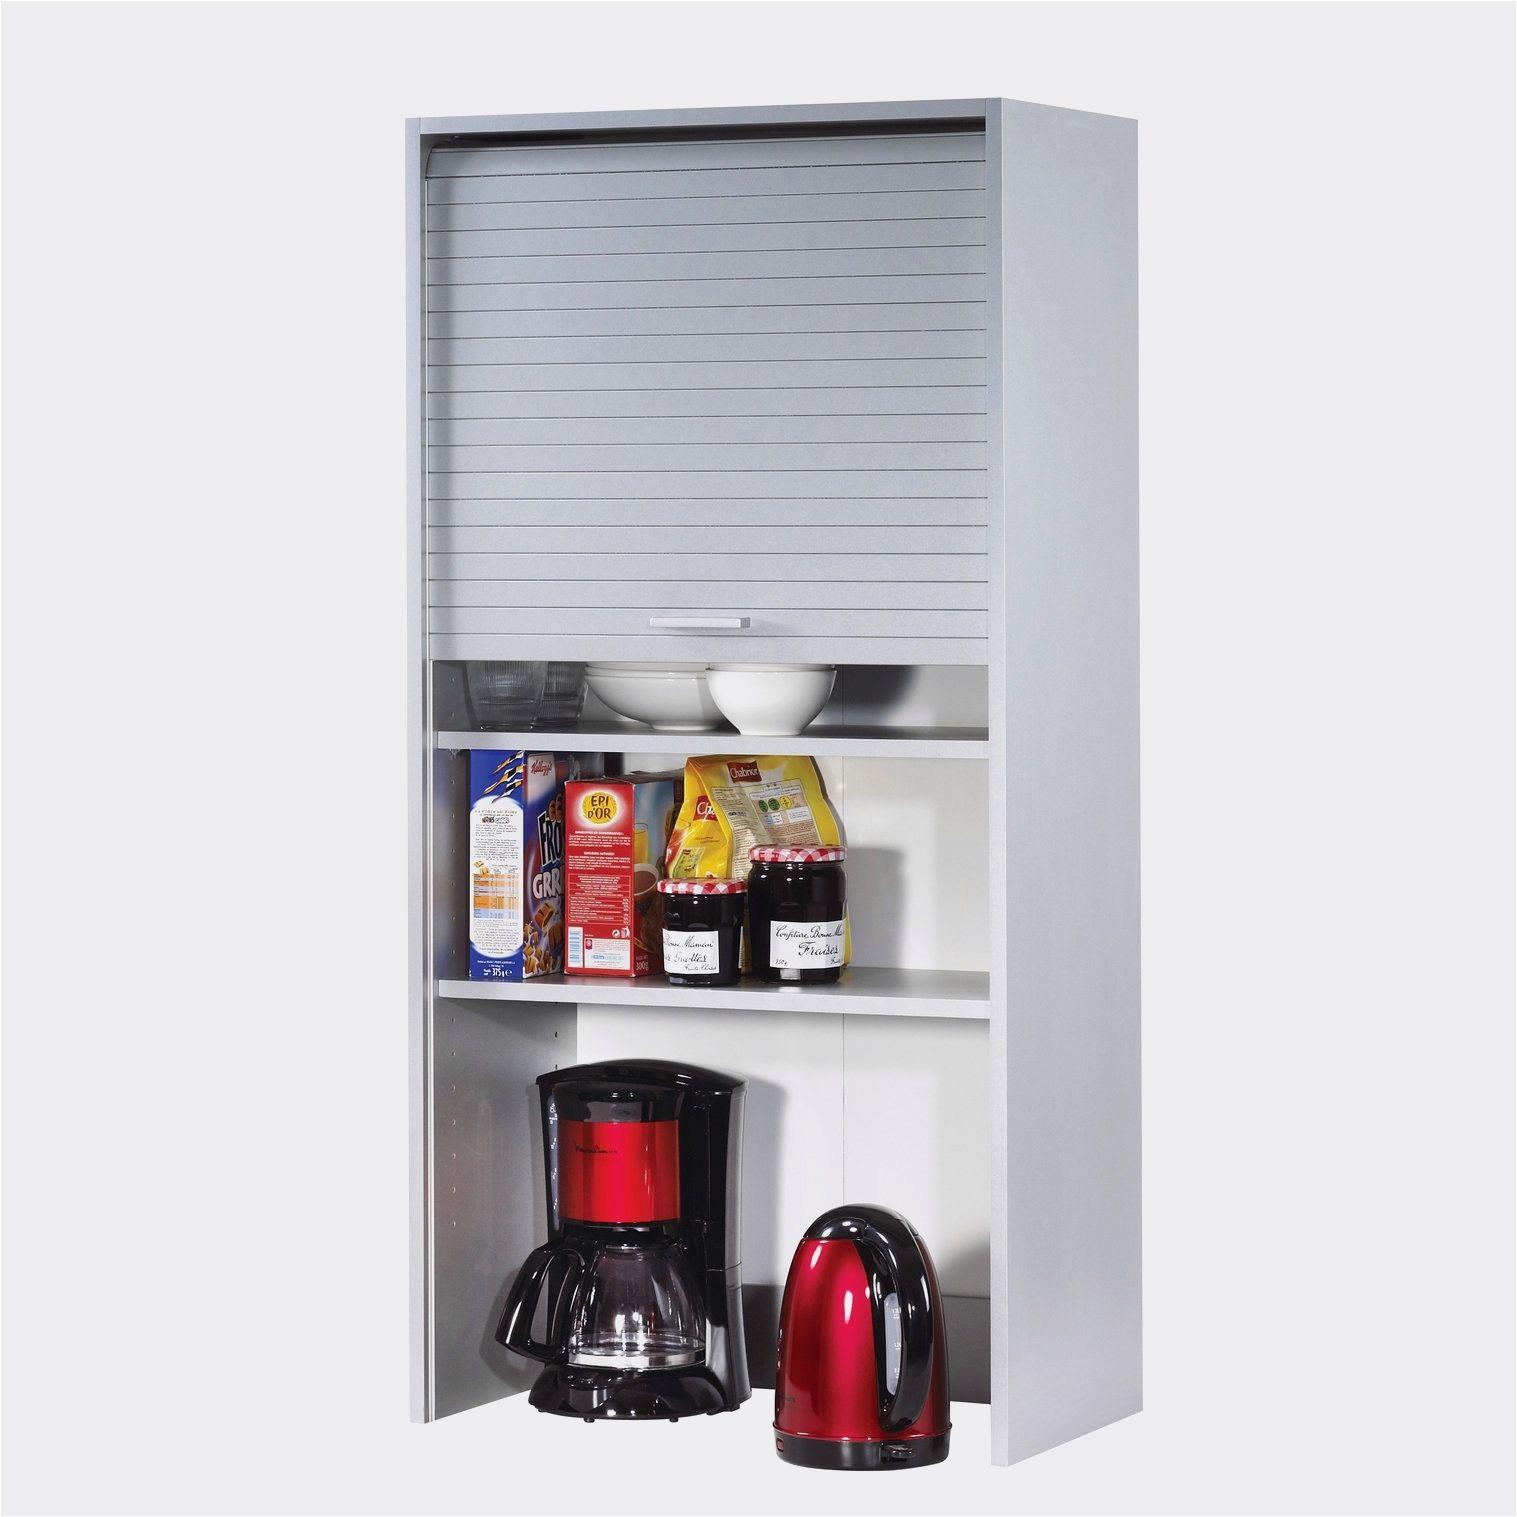 Meuble Petit Dejeuner Ikea Trick In 2020 Tall Cabinet Storage